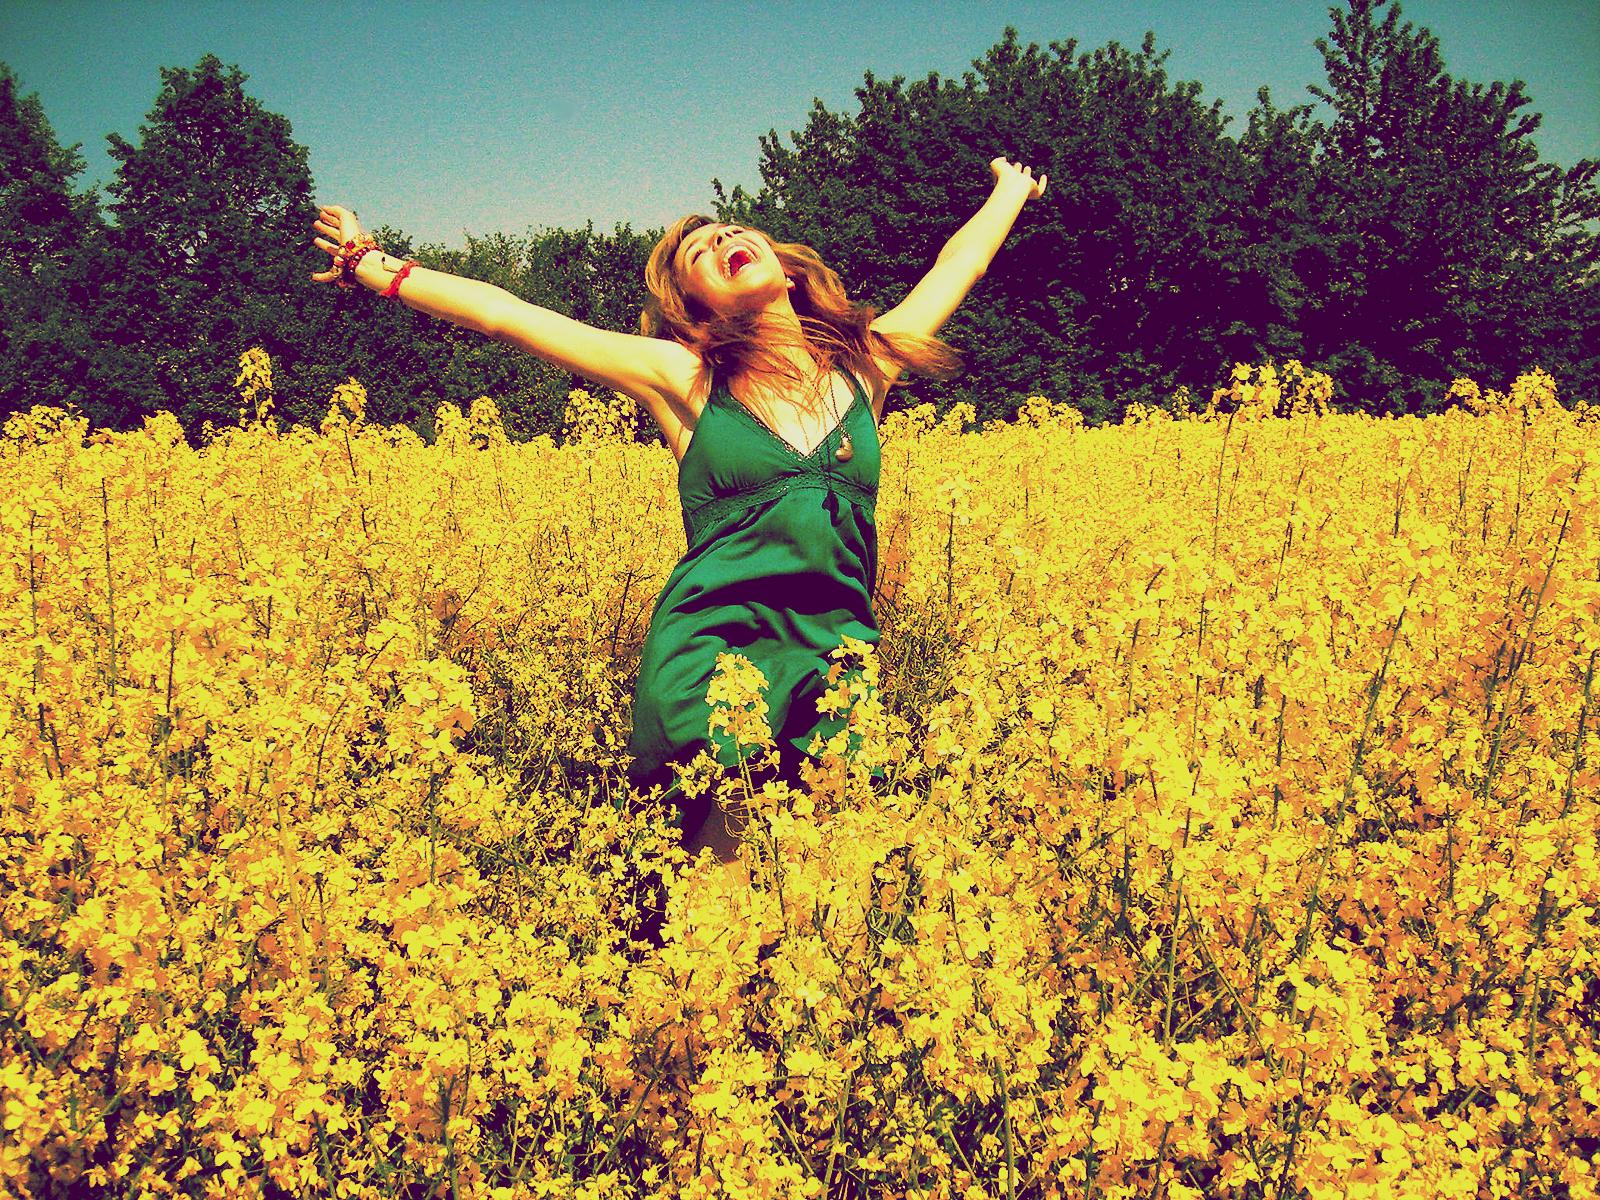 http://2.bp.blogspot.com/-hH1tav-XWdU/ThYardfL8RI/AAAAAAAAAko/sChLK4xxzoU/s1600/happy_hippie_by_himbeerkuss.jpg